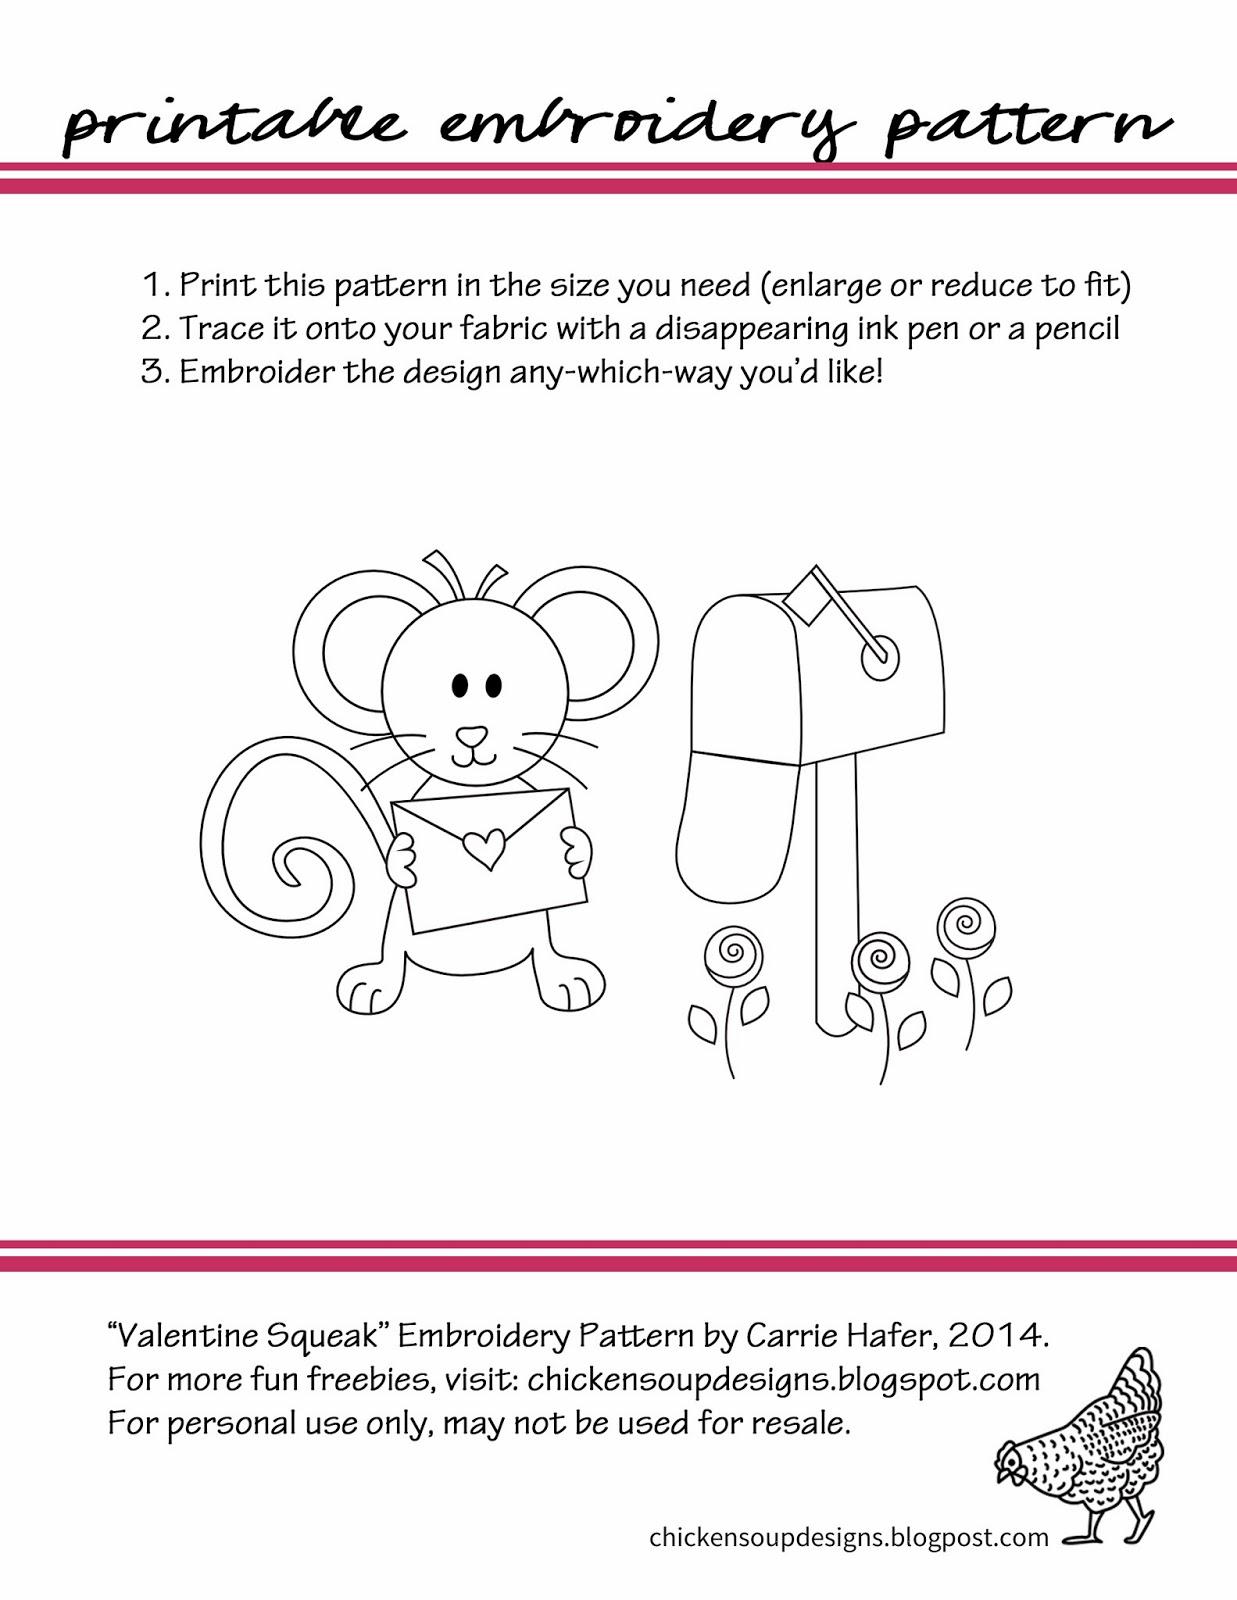 https://dl.dropboxusercontent.com/u/74477577/Valentine%20Squeak%20Embroidery%20Pattern.pdf